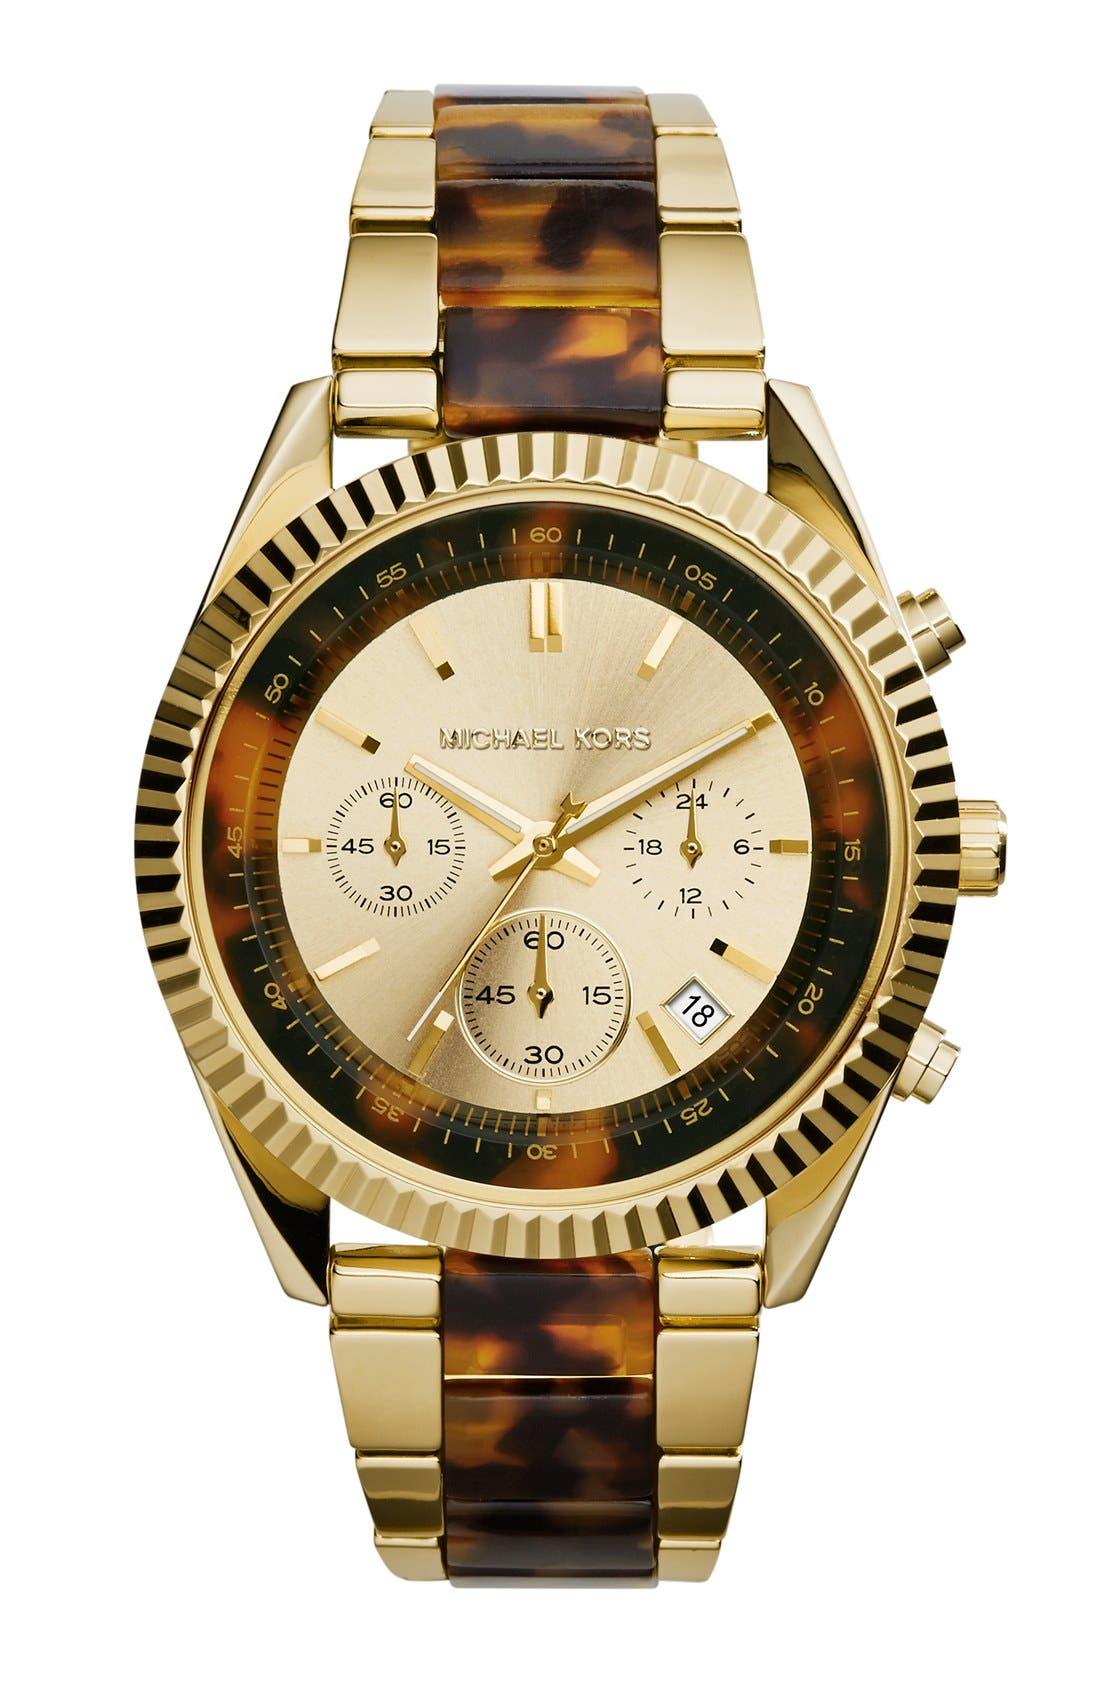 Alternate Image 1 Selected - Michael Kors 'Clarkson' Chronograph Acetate Link Bracelet Watch, 42mm